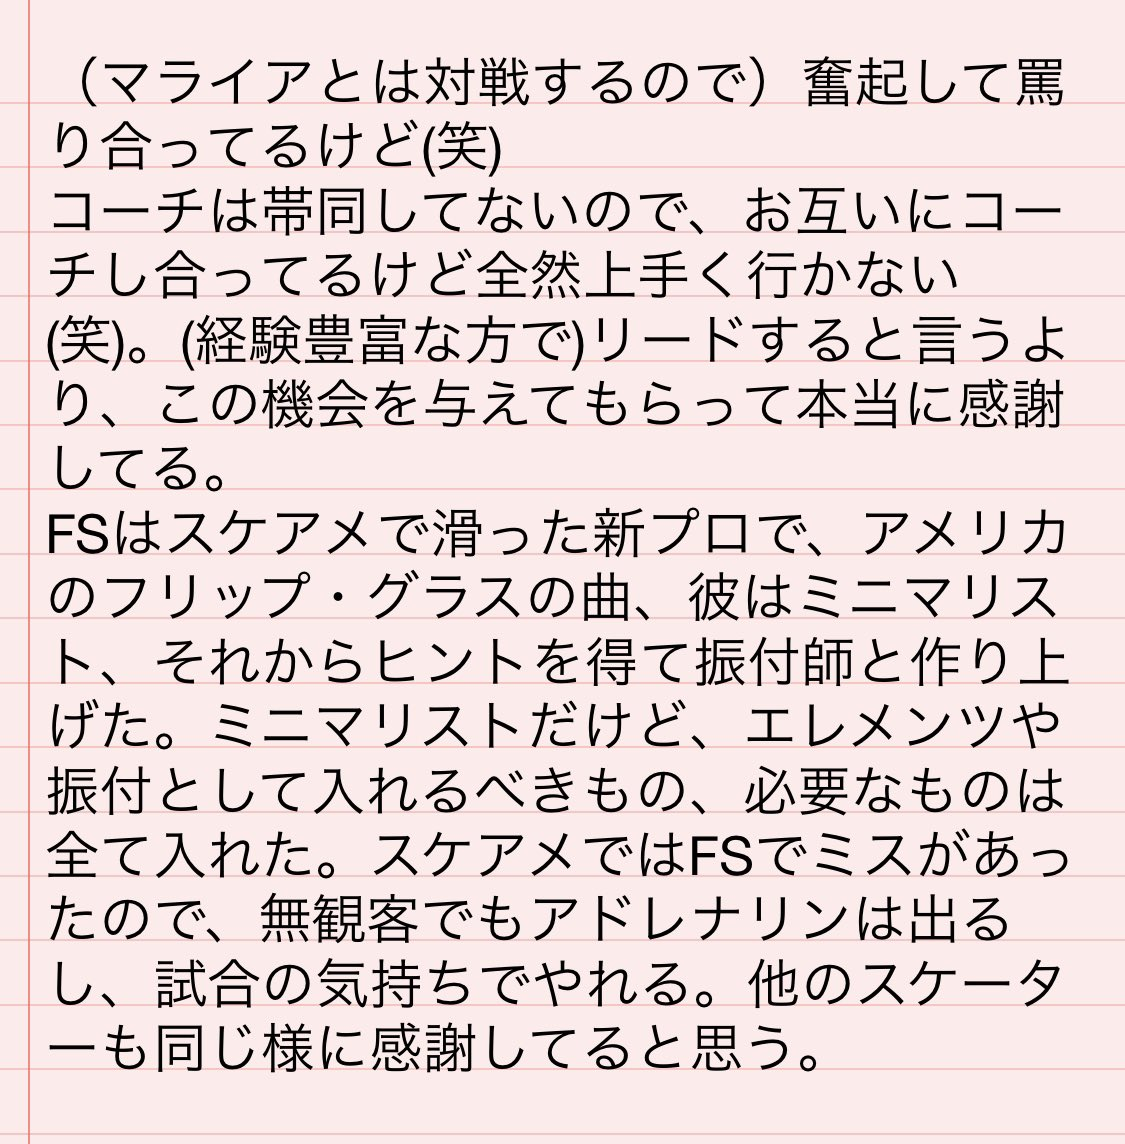 f:id:marosakura:20201114034642p:plain